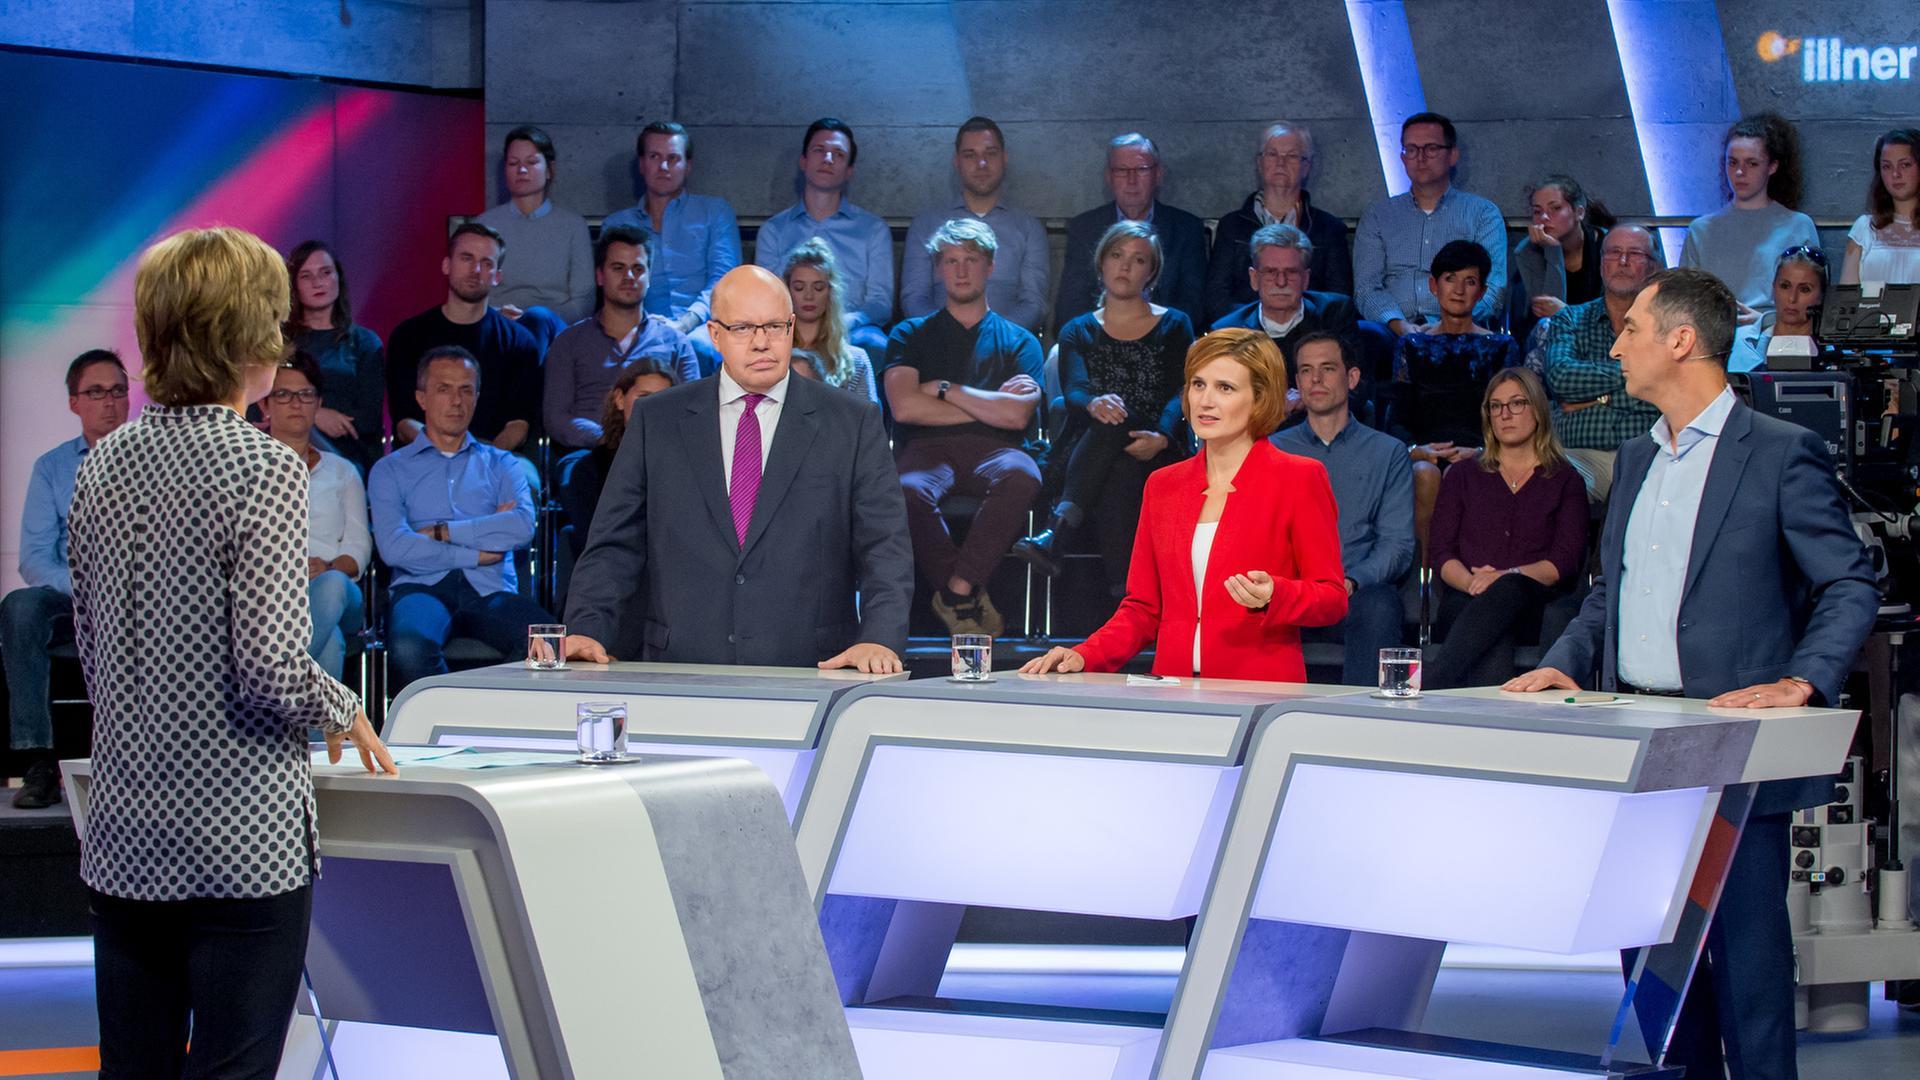 September 2017 ZDFmediathek